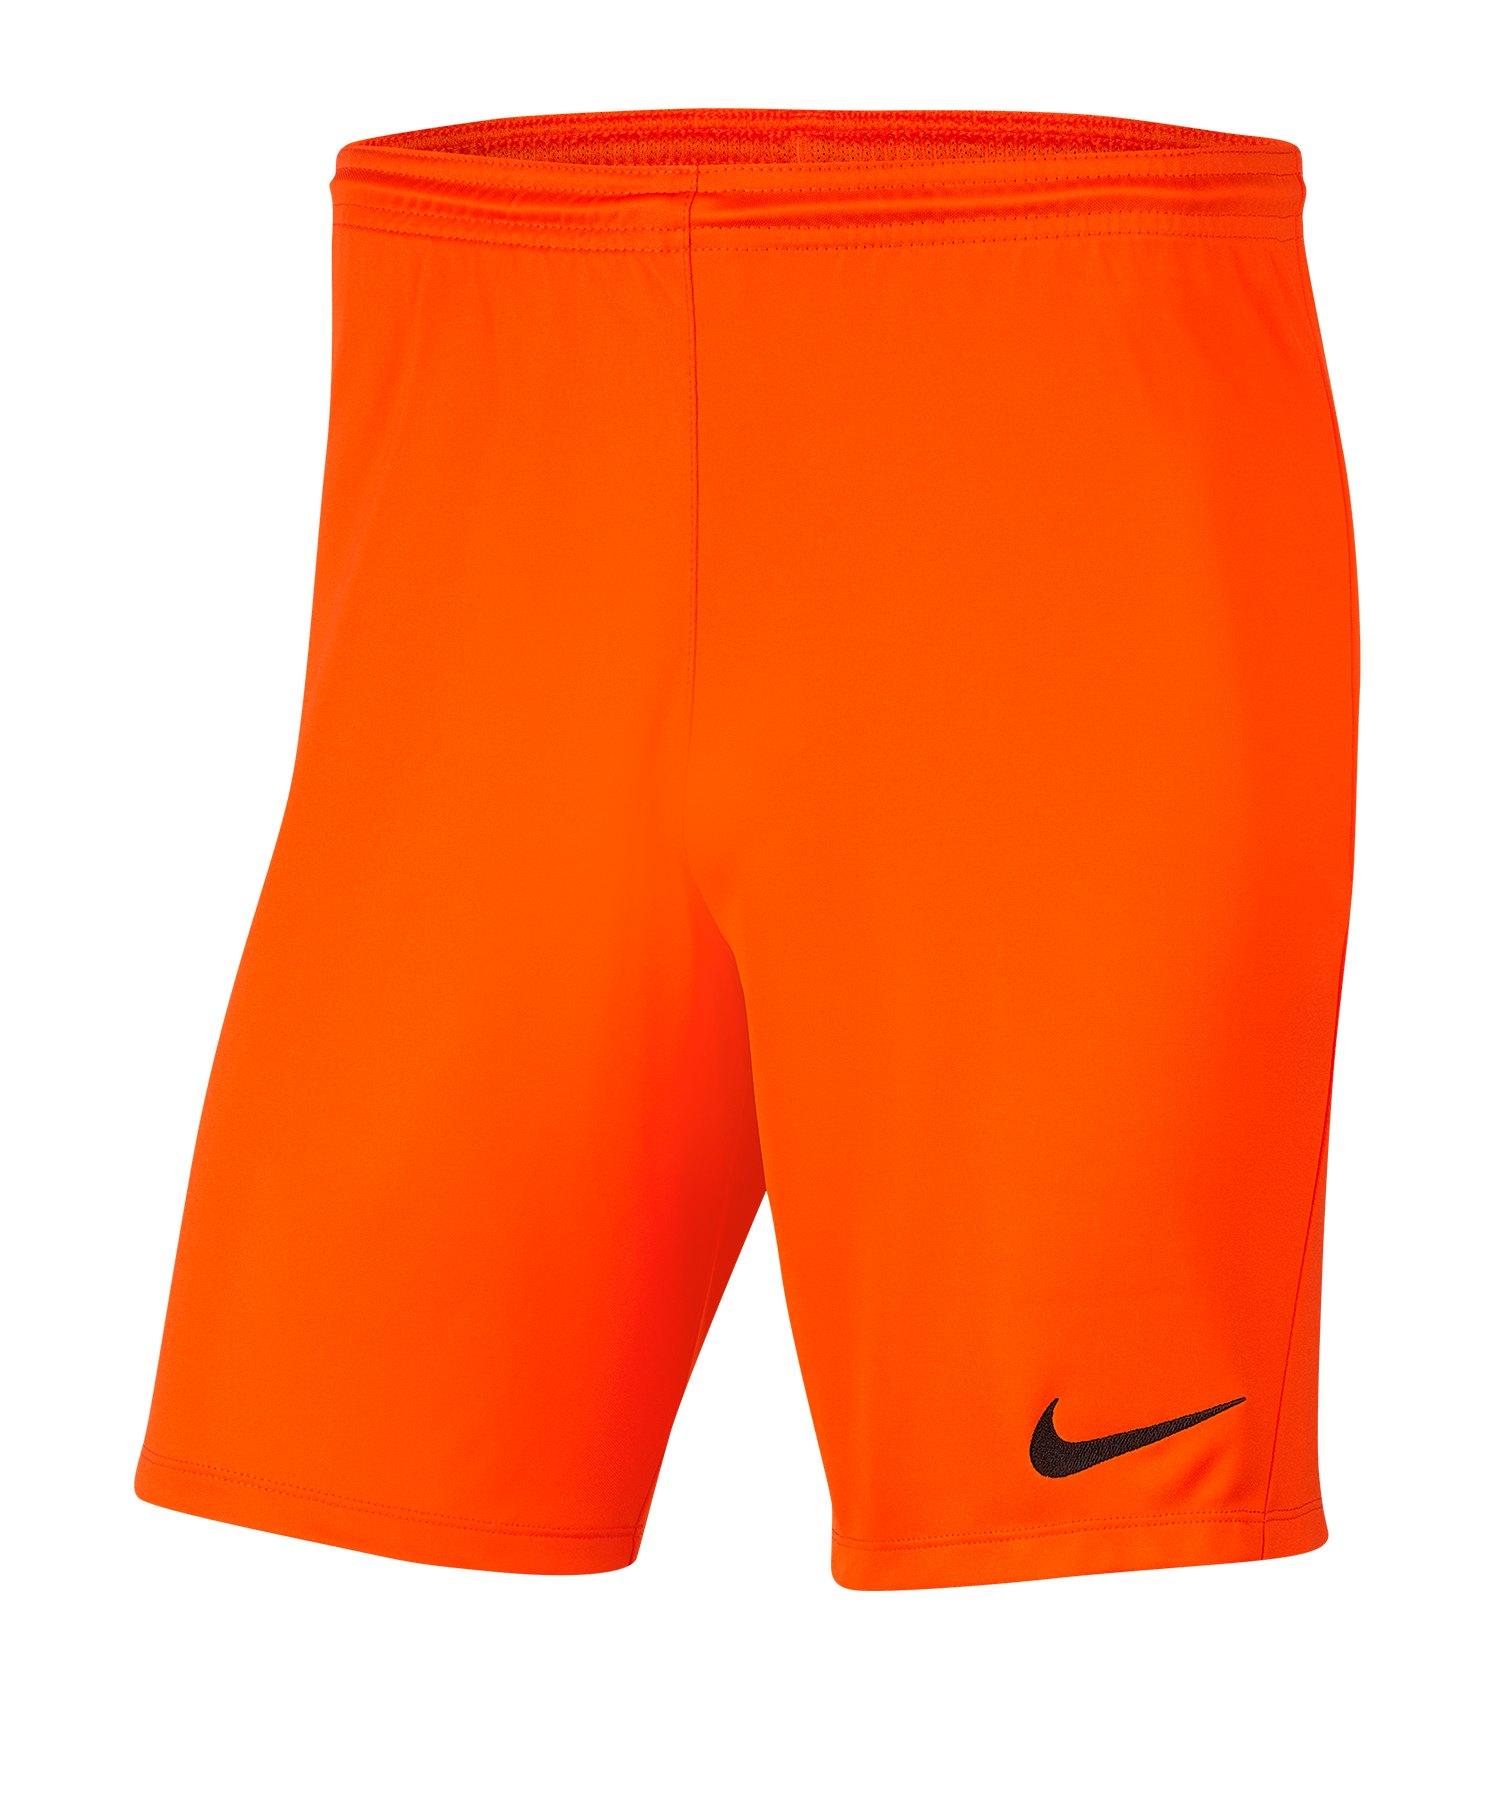 Nike Park III Short Orange F819 - orange